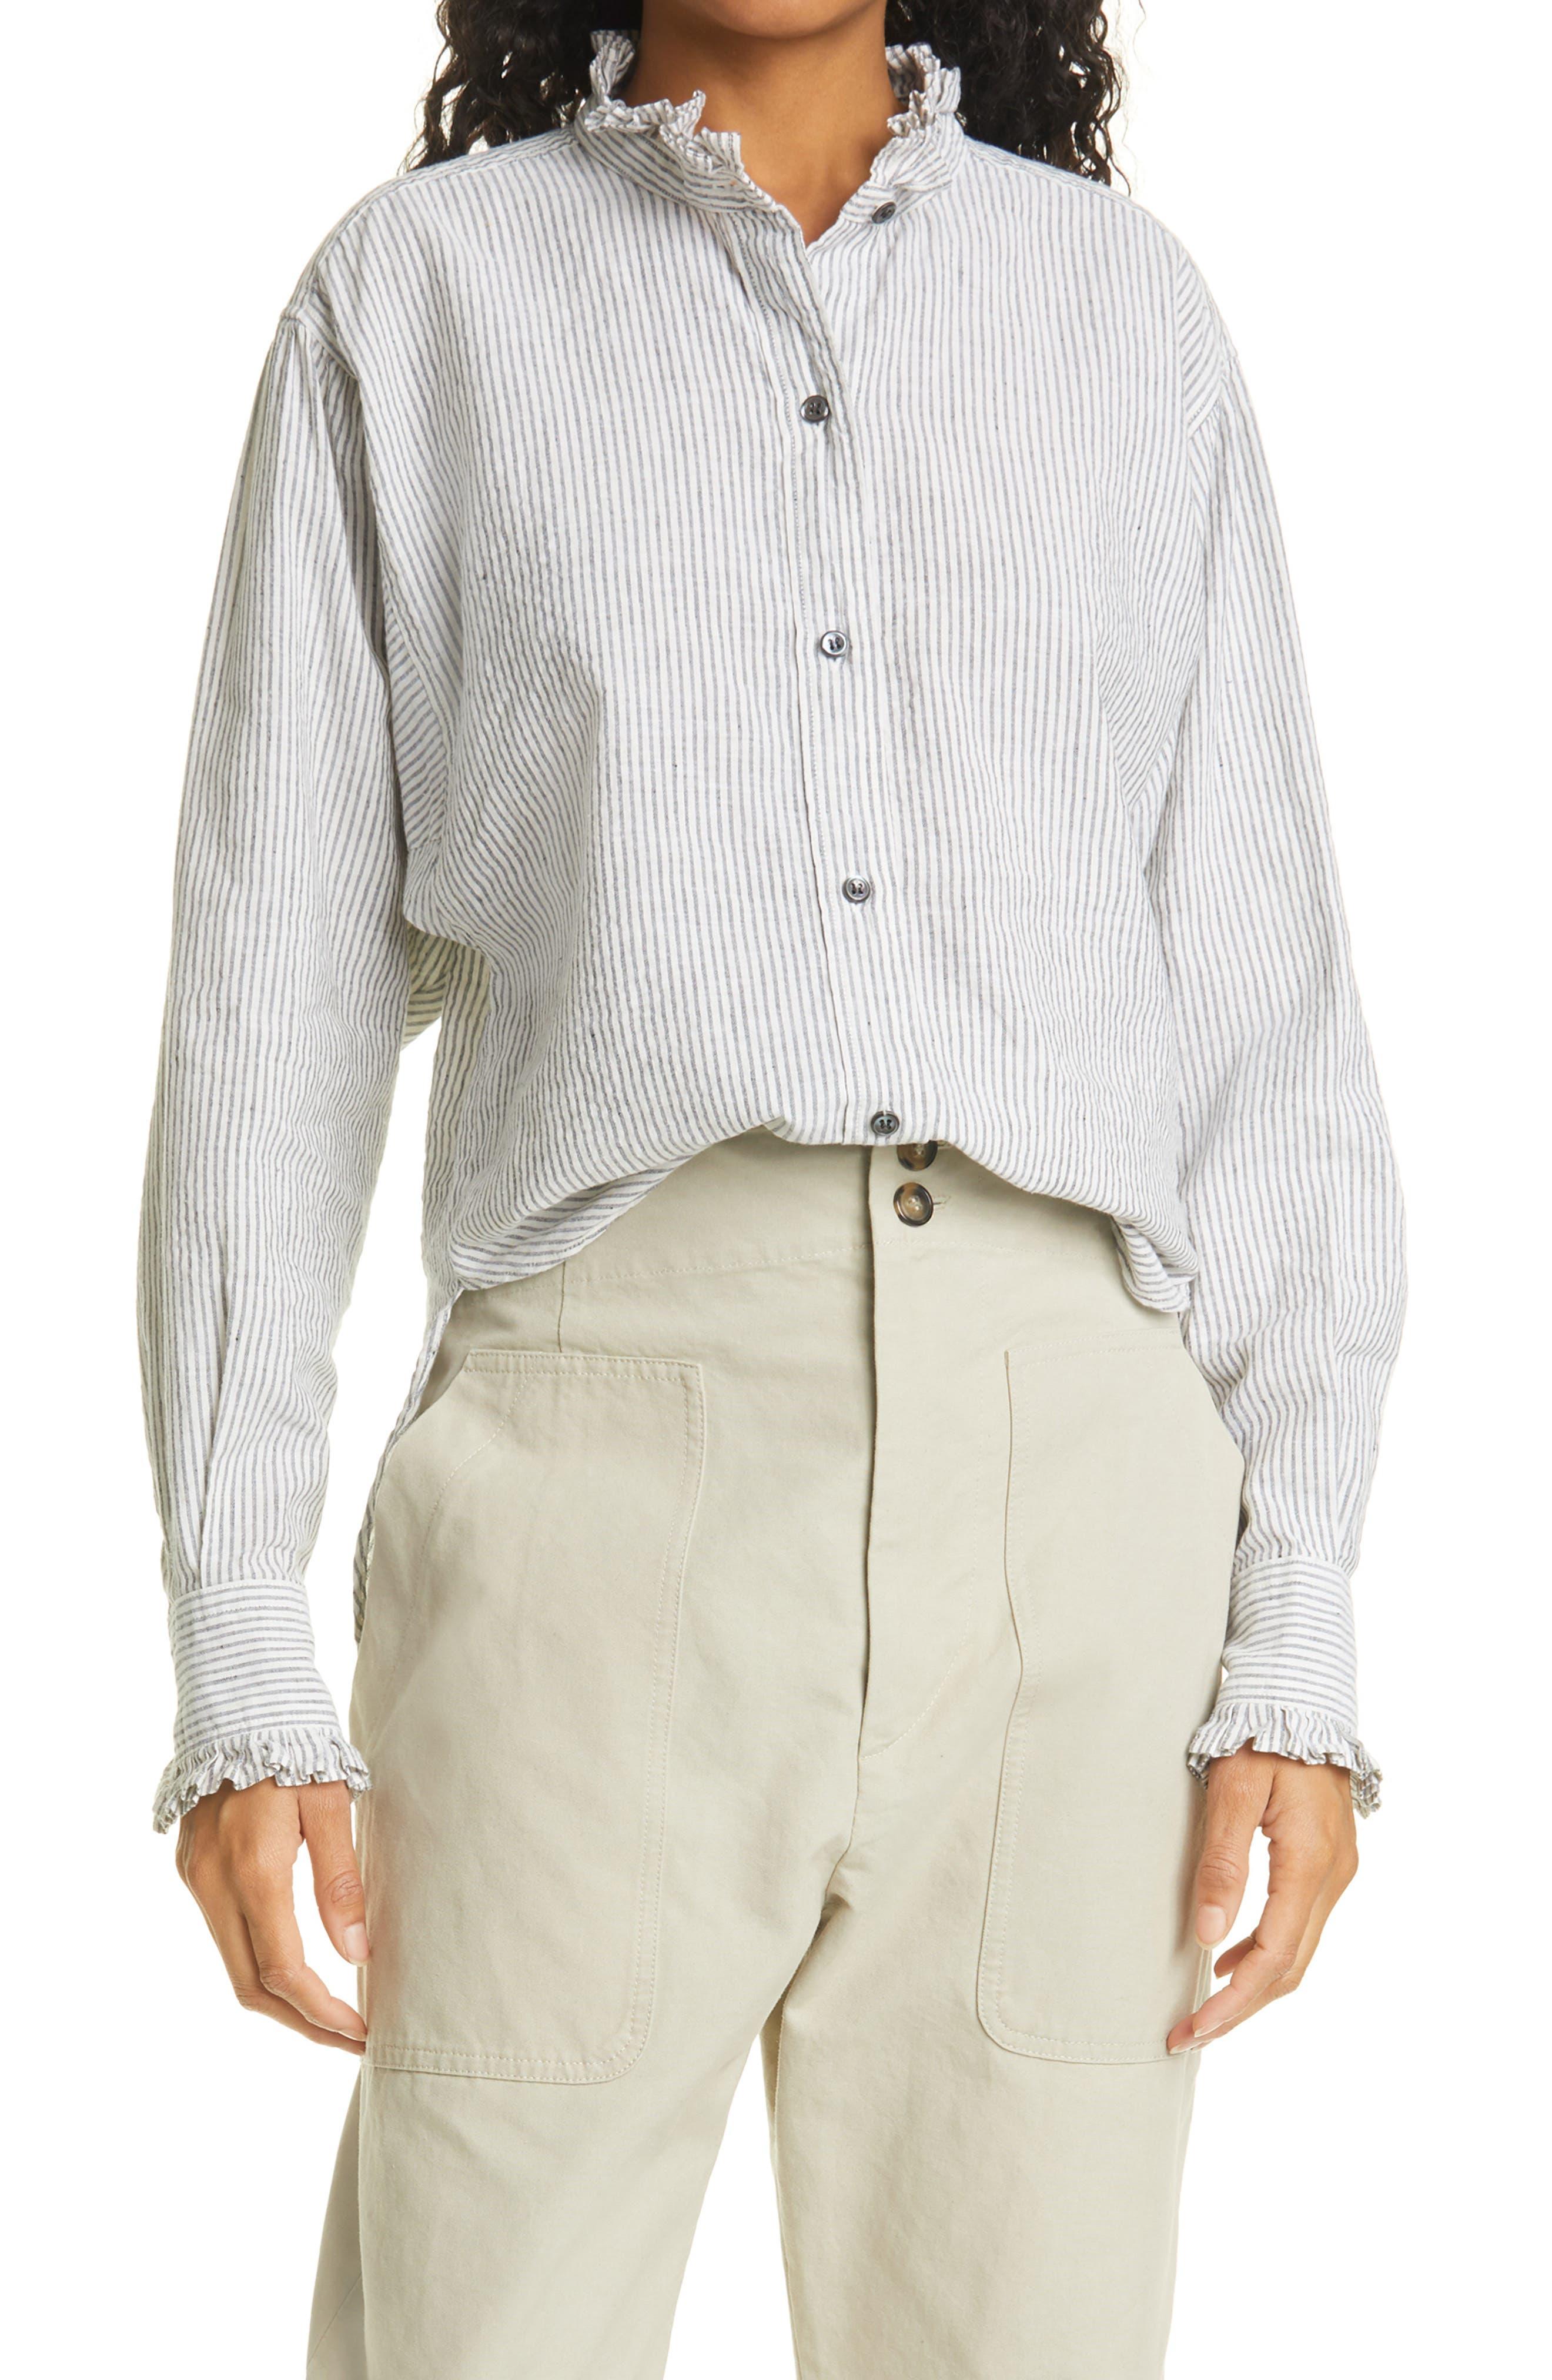 Women's Isabel Marant Etoile Saoli Stripe Cotton & Linen Button-Up Shirt